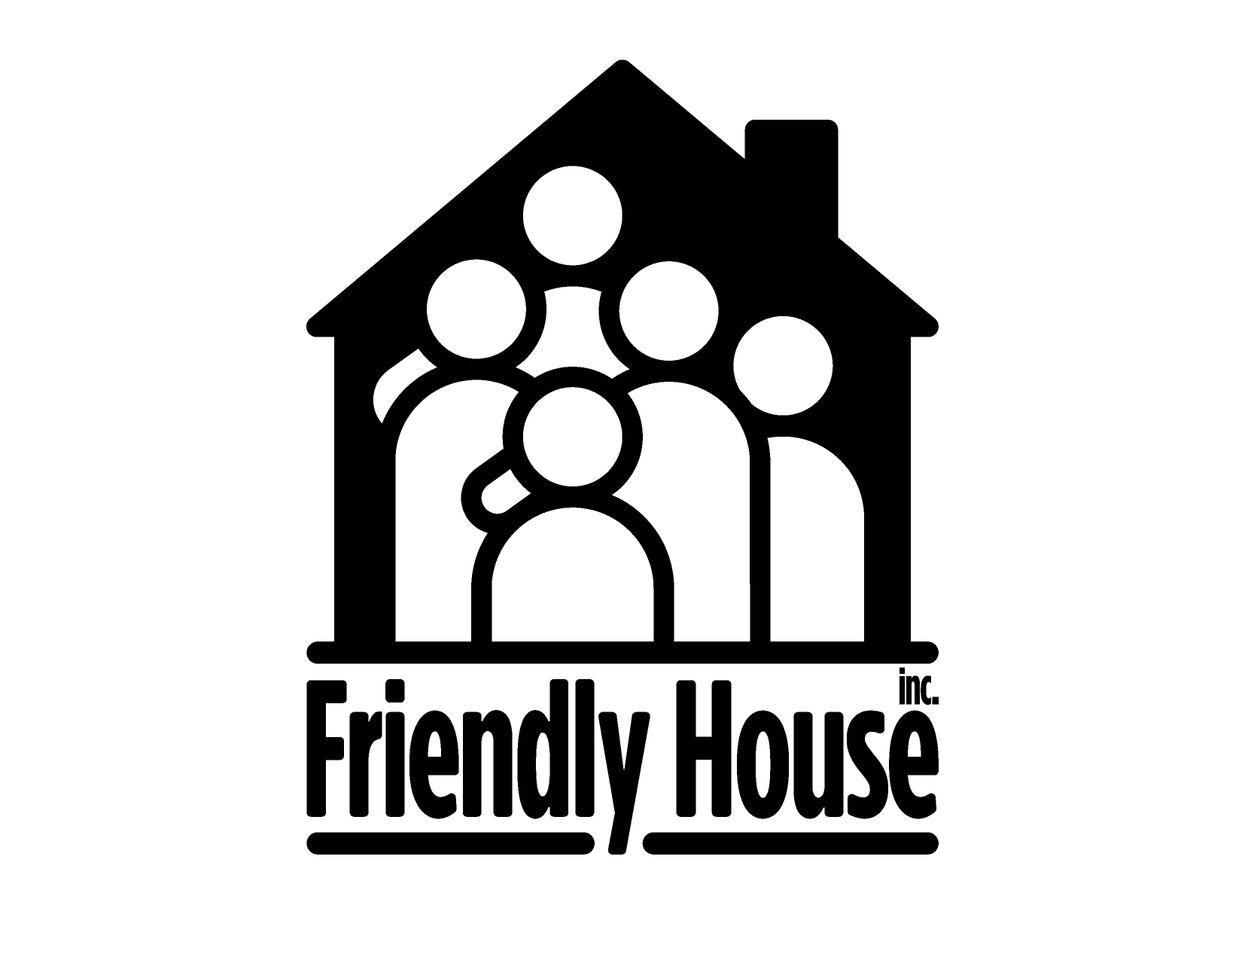 FriendlyHouse